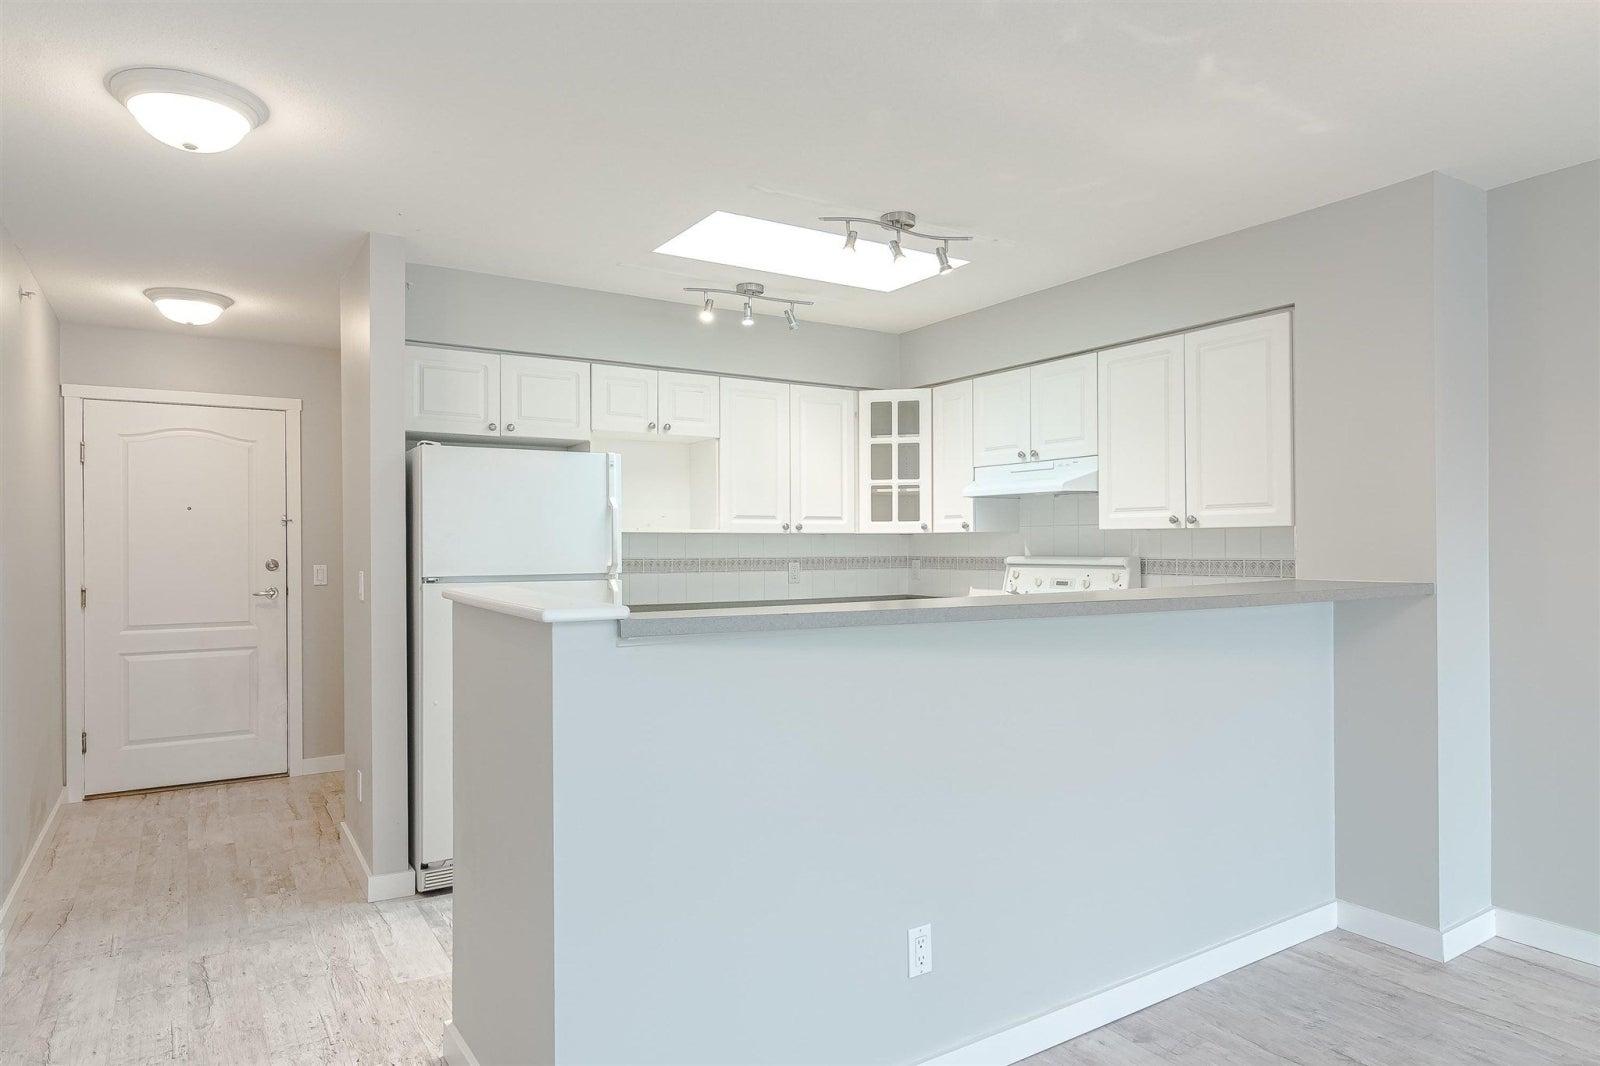 405 20268 54 AVENUE - Langley City Apartment/Condo for sale, 2 Bedrooms (R2604183) #5